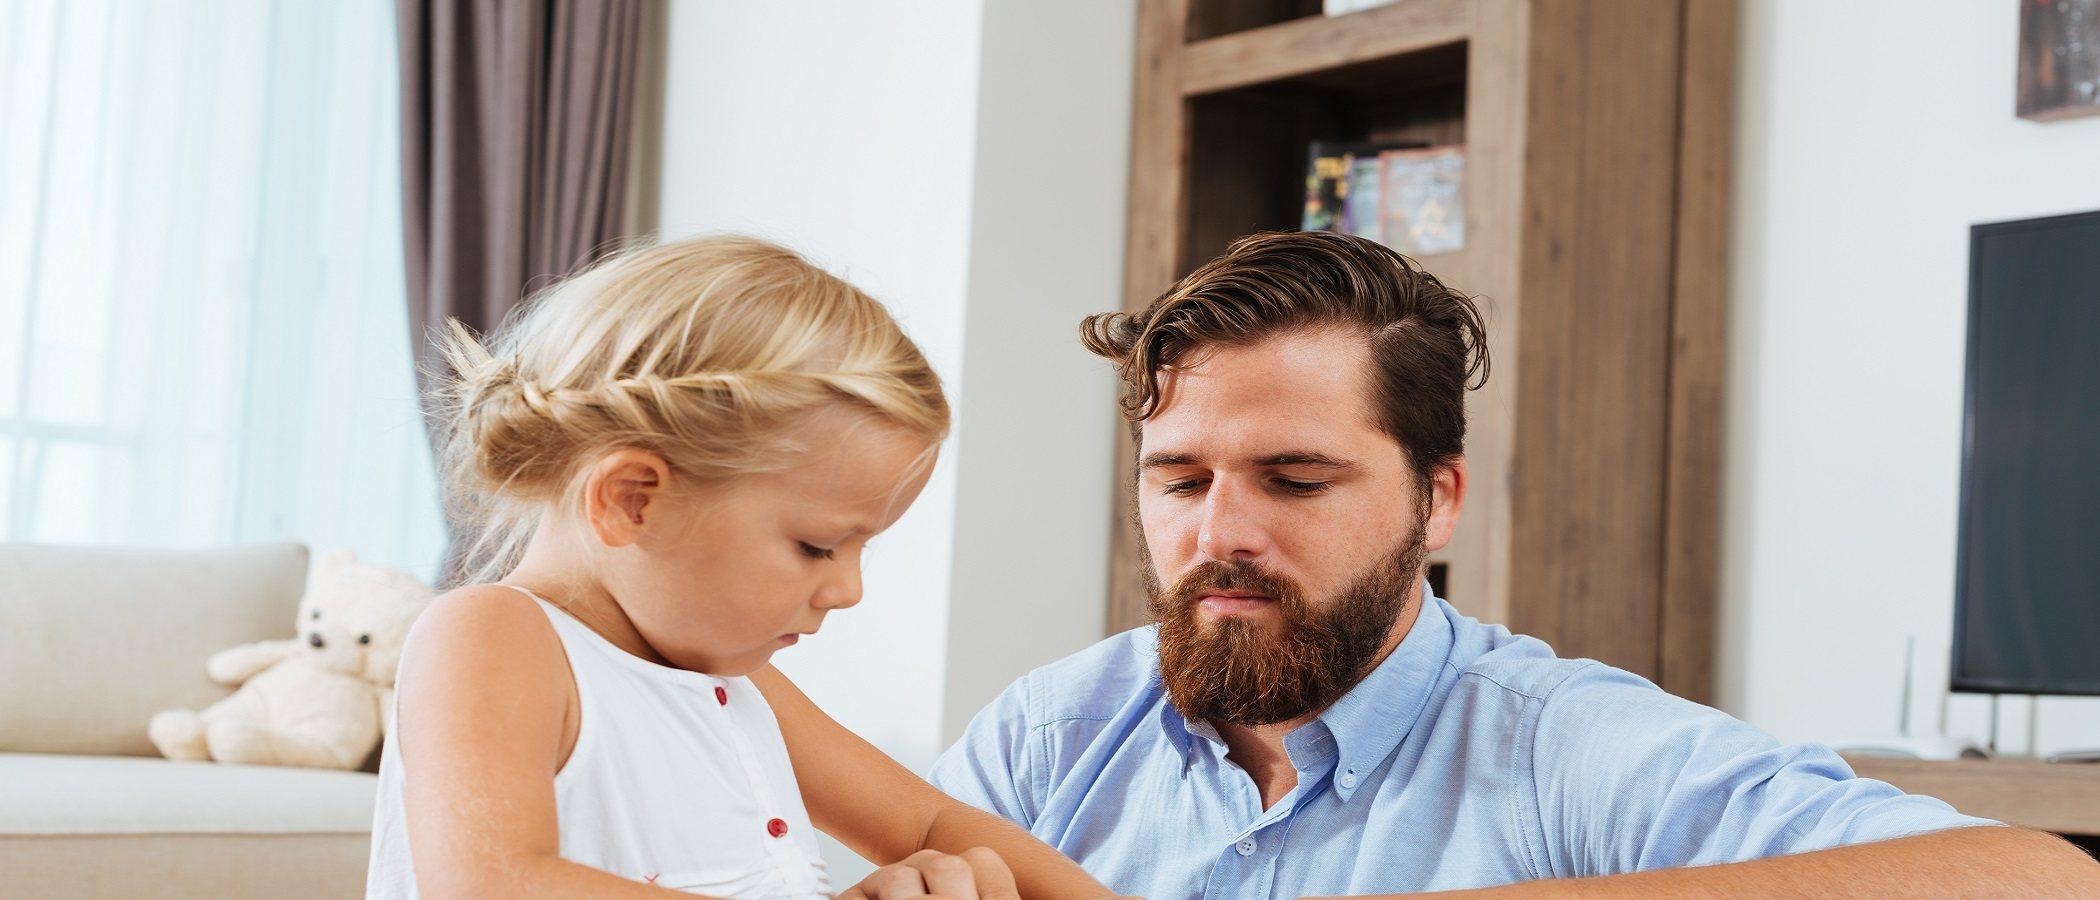 Manualidades para niños con cartulina